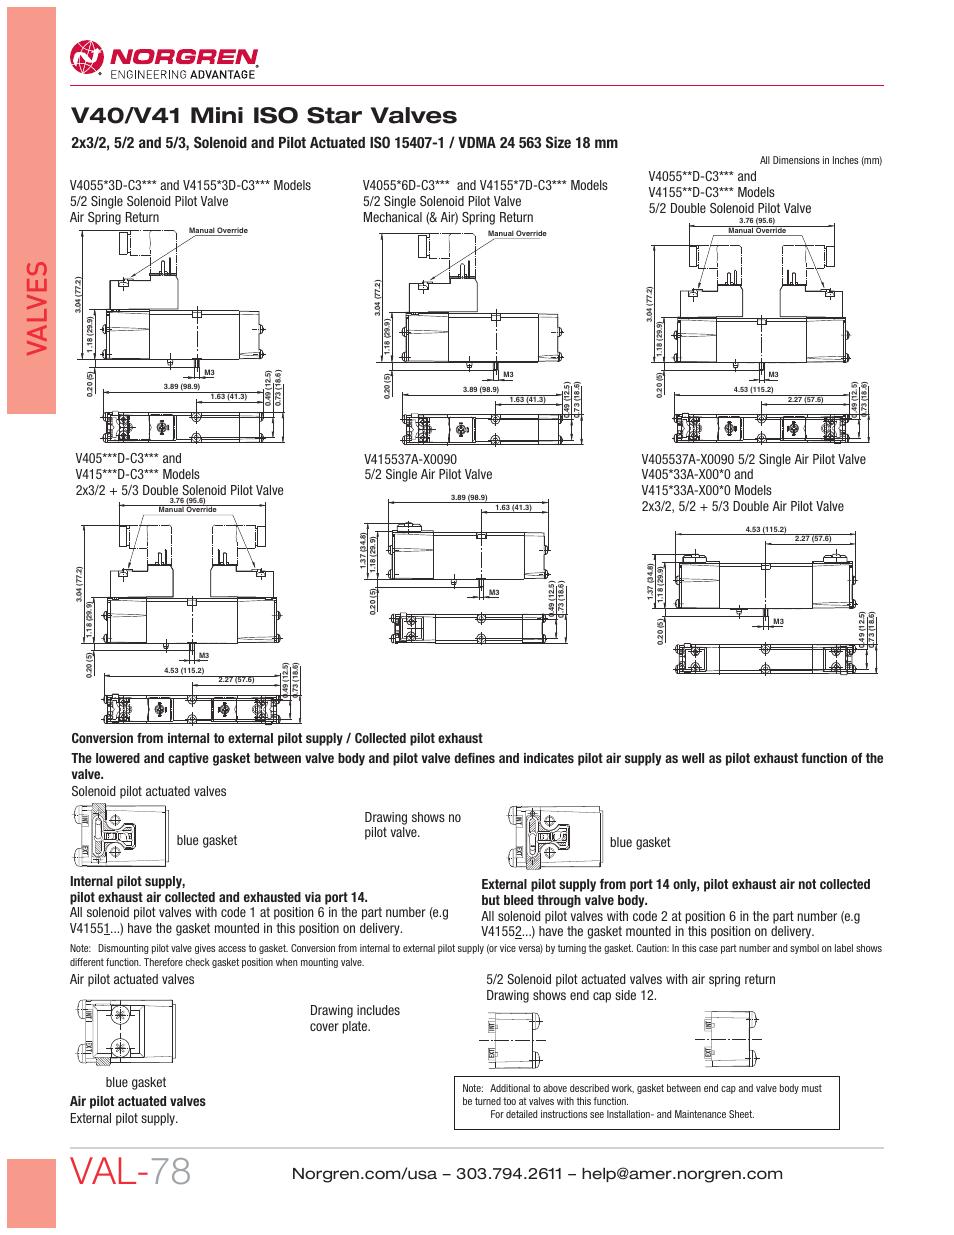 ... Array - val 78 val ves v40 v41 mini iso star valves norgren v41 mini rh